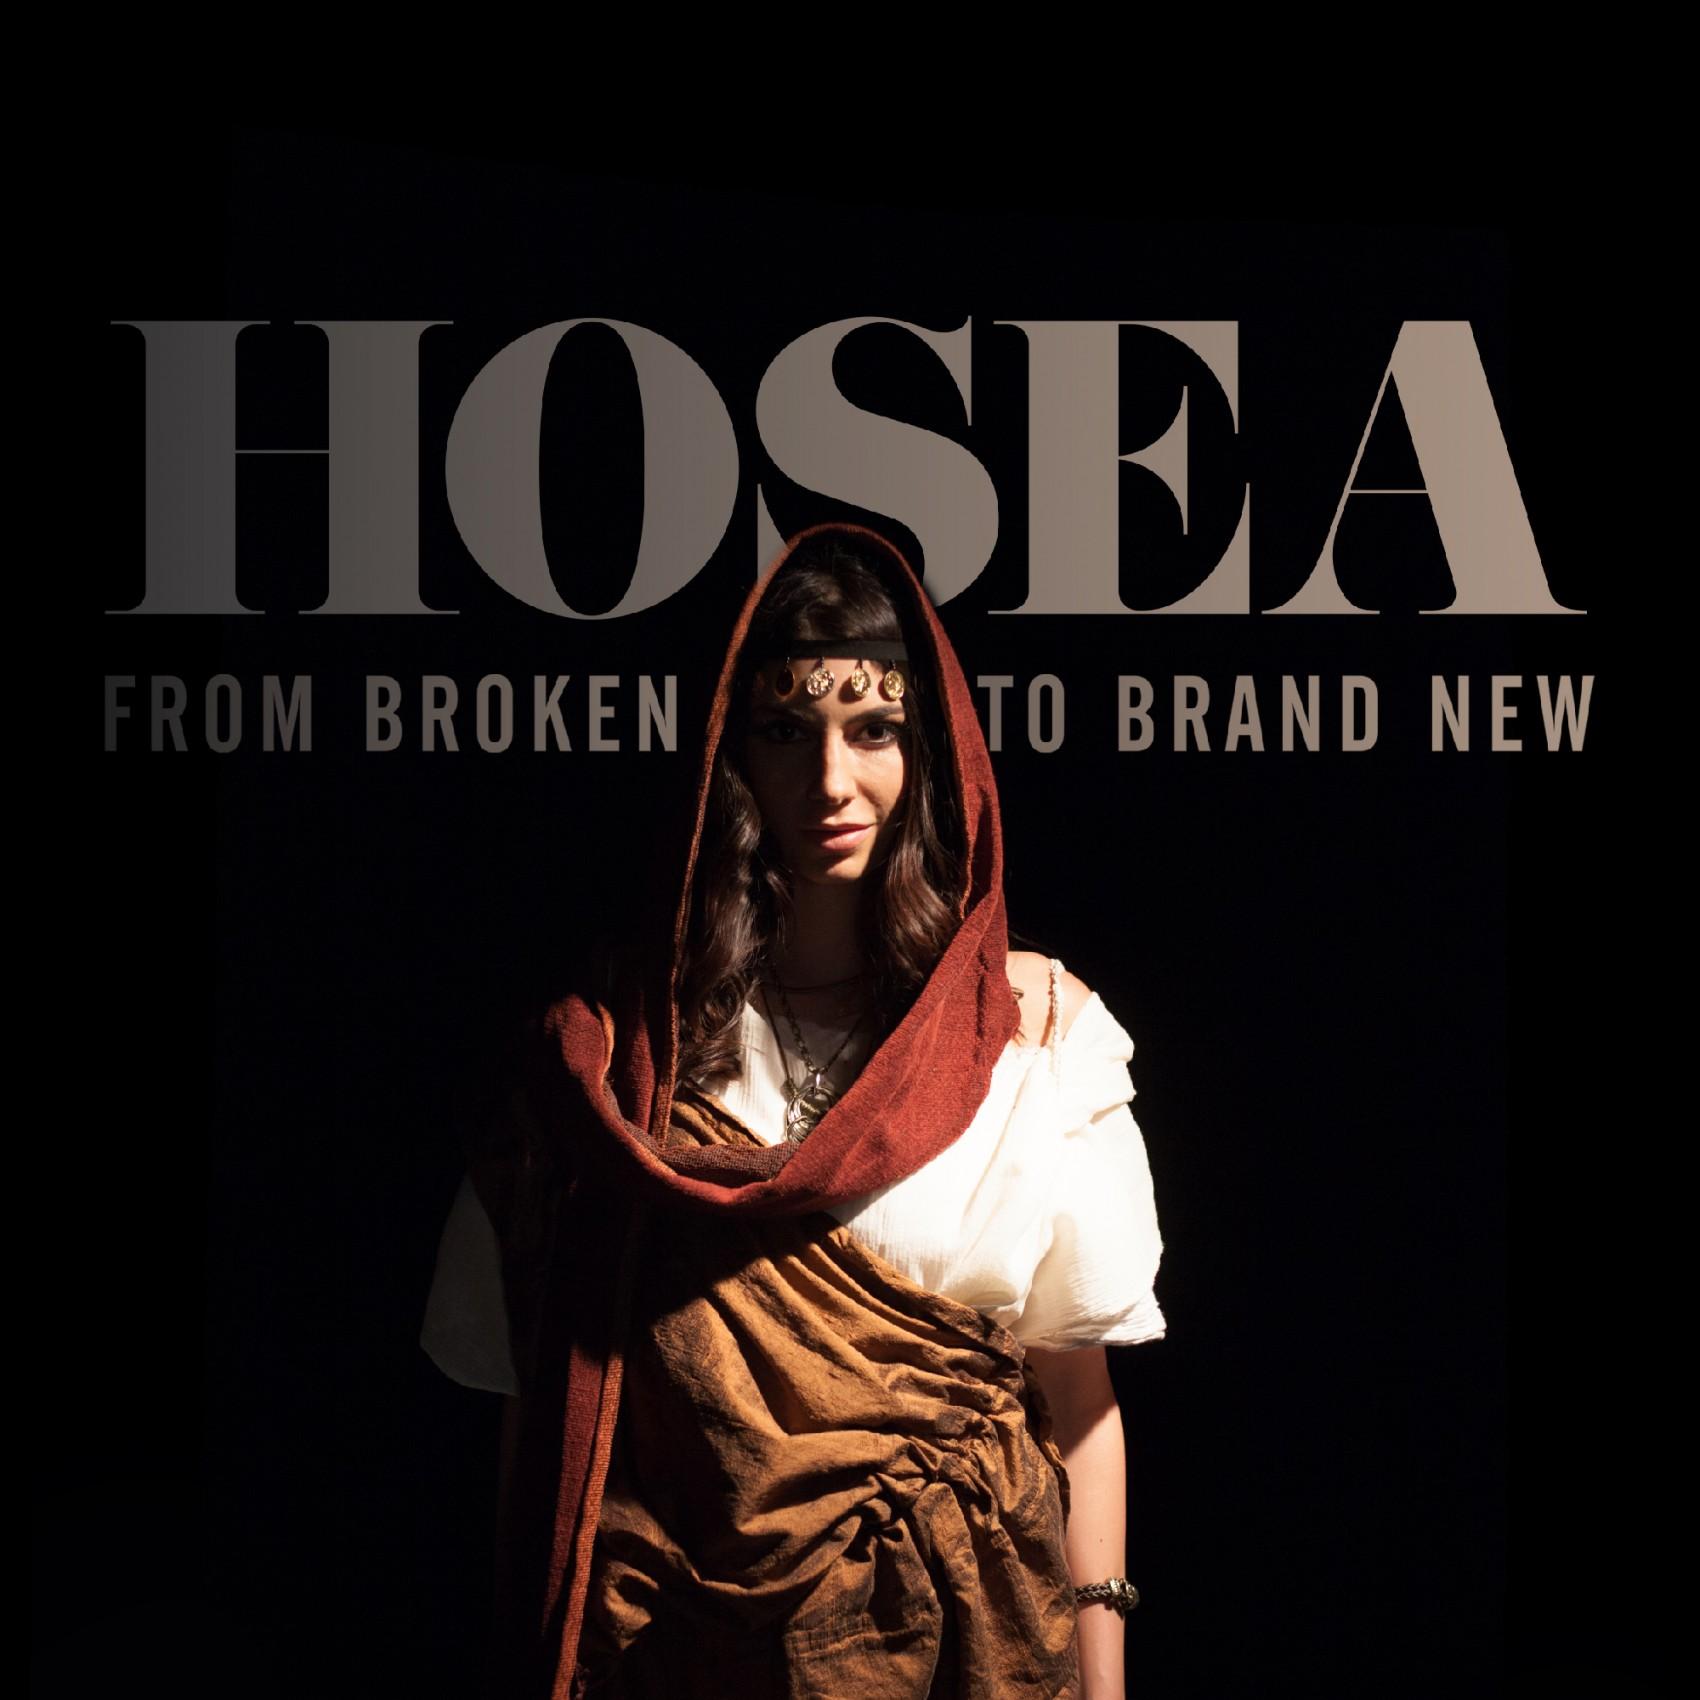 Hosea: From Broken To Brand New